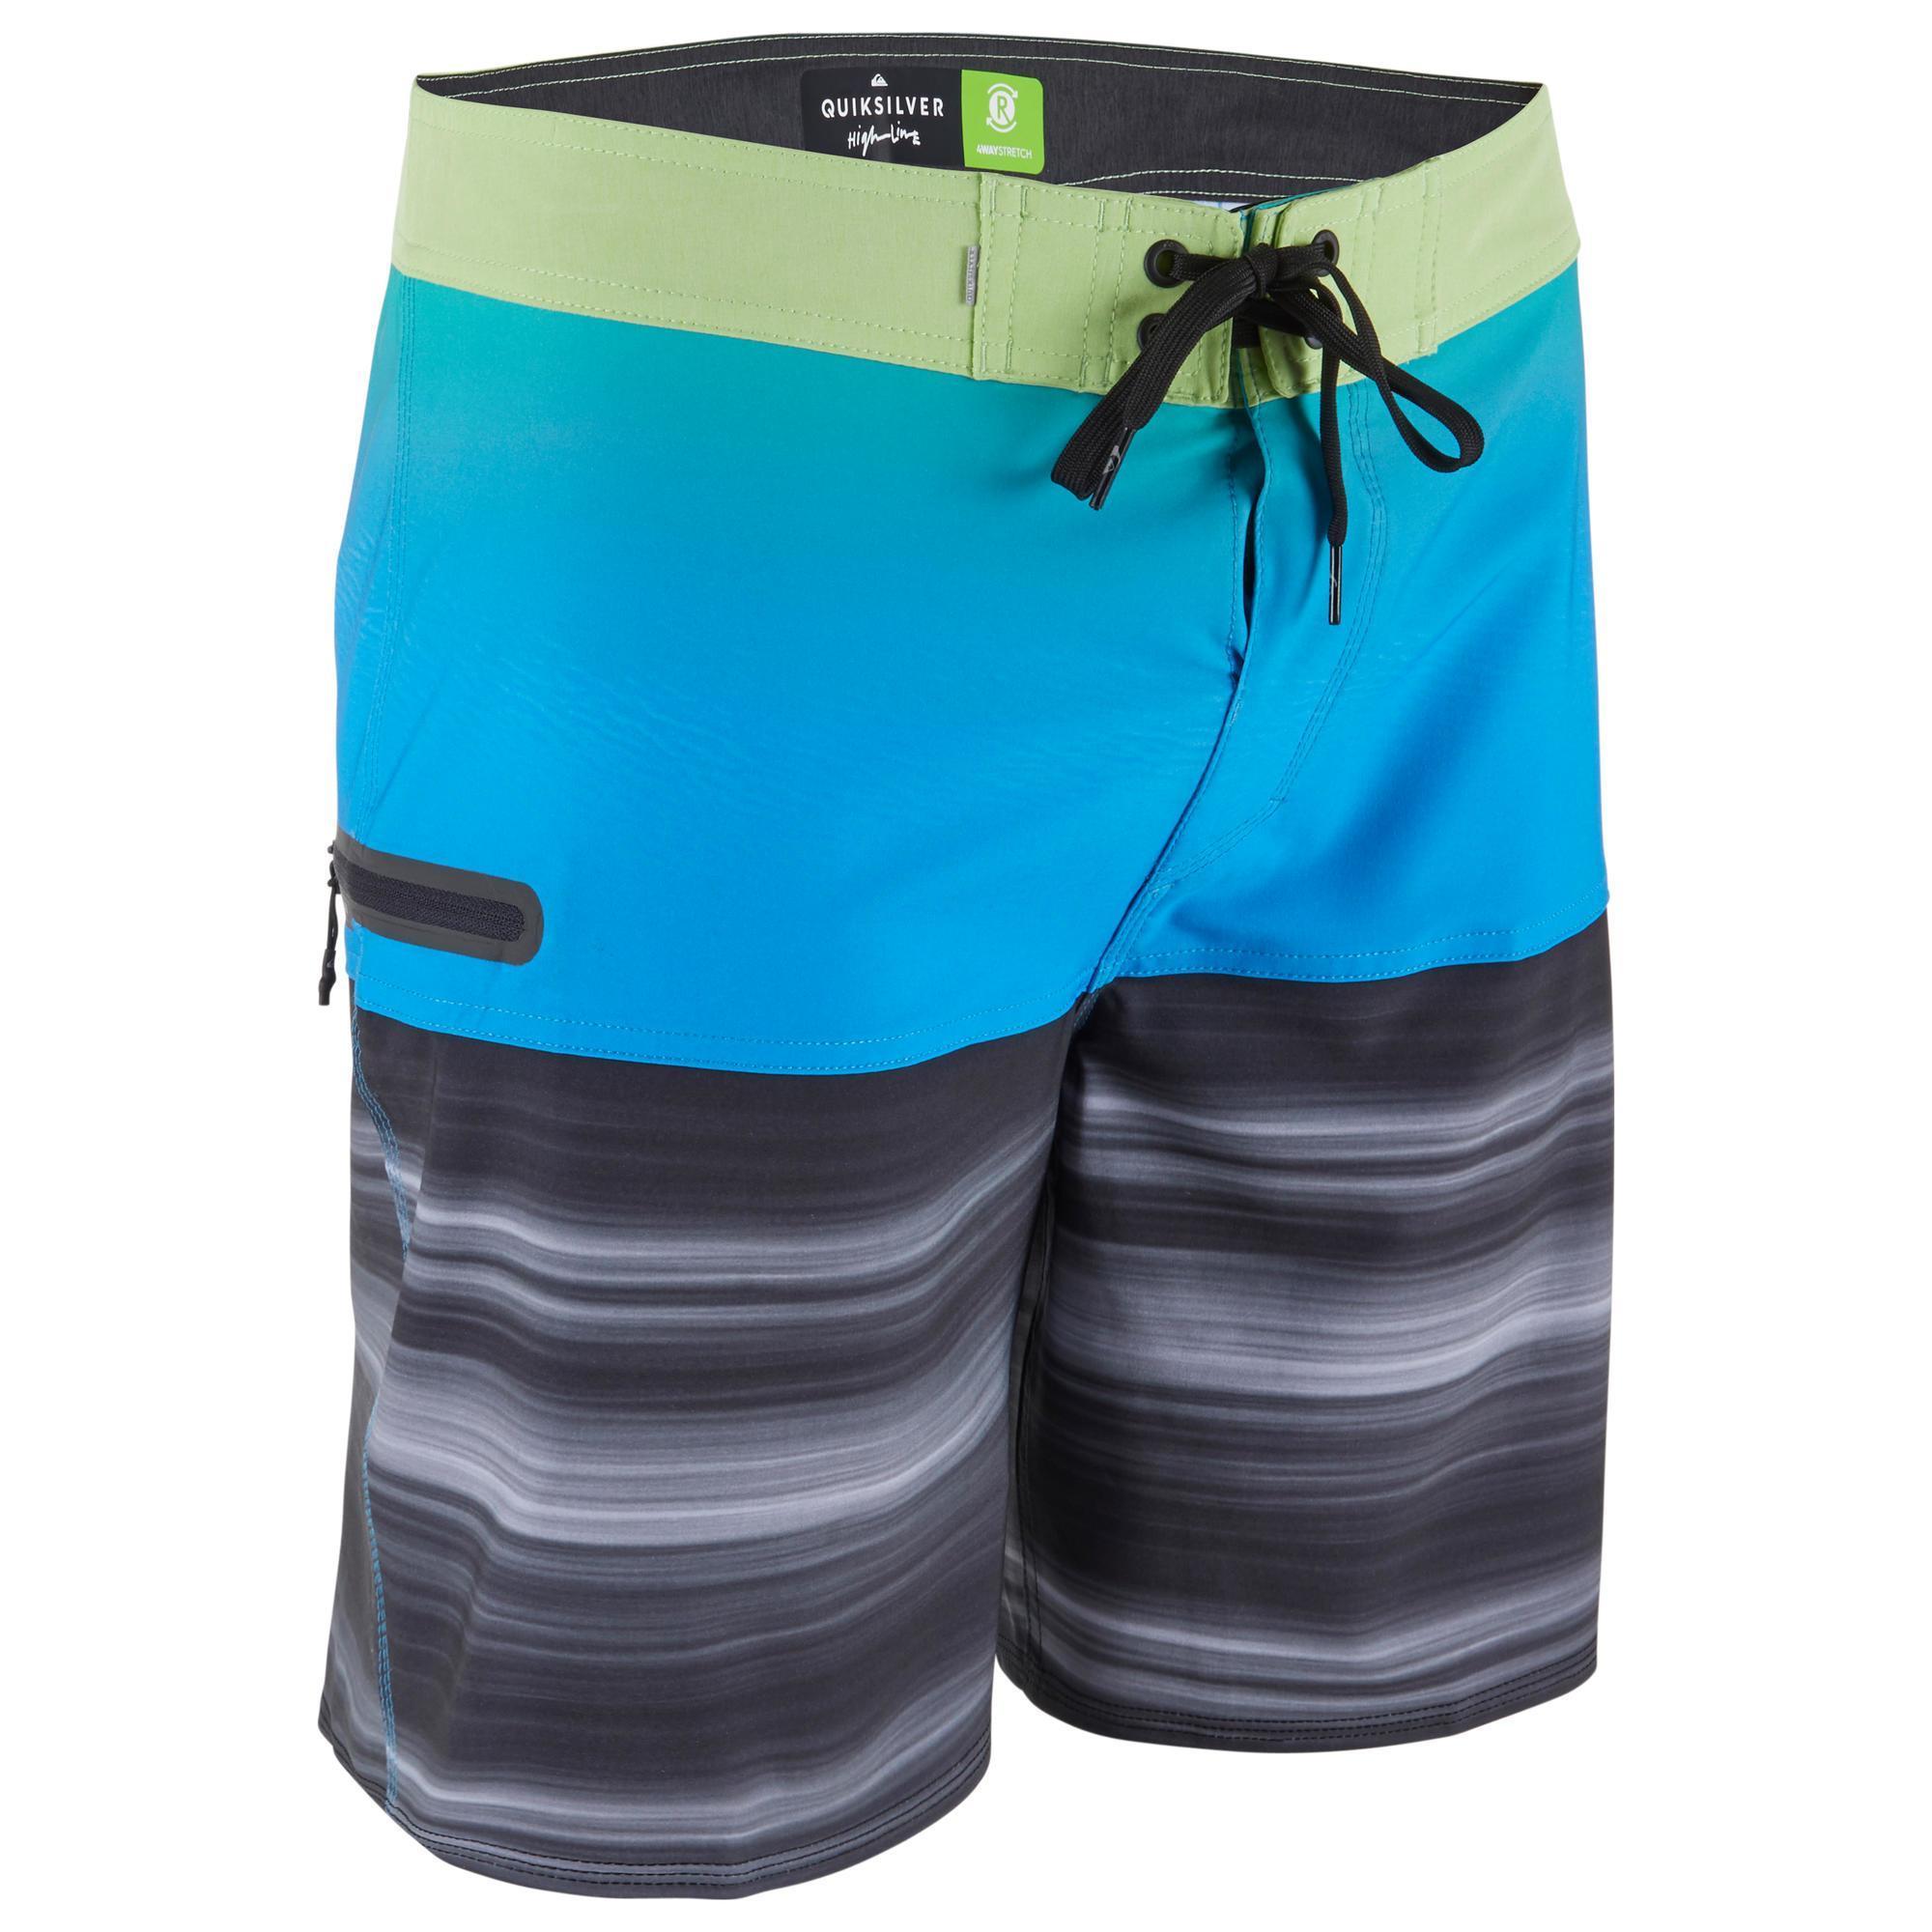 Boardshorts Highline 18´ Stretch Malibu Herren blau | Bekleidung > Bademode > Boardshorts | Quiksilver